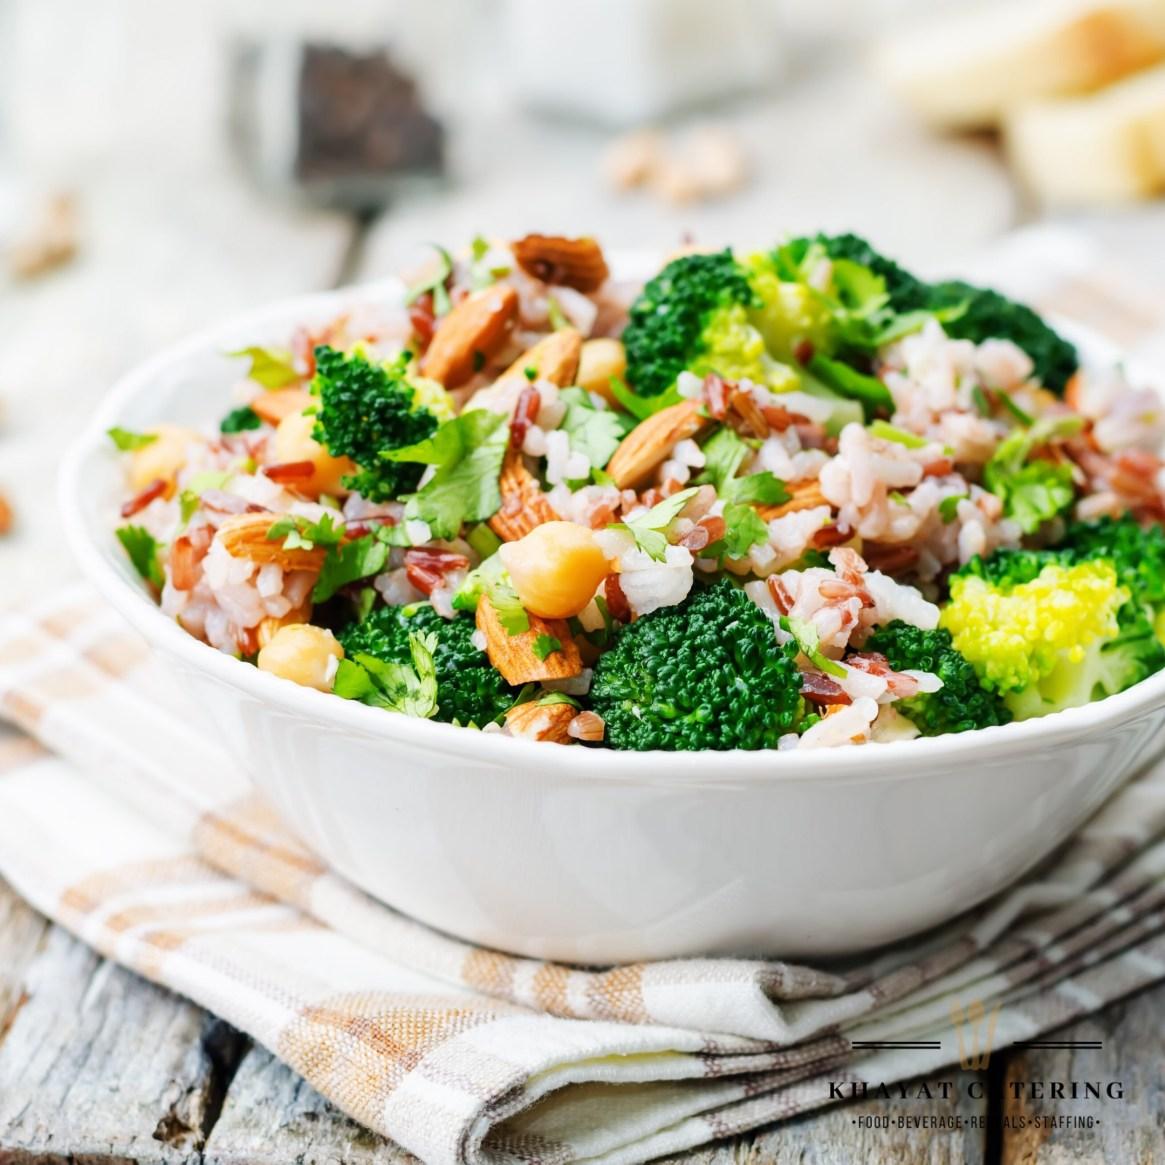 Khayat Catering broccoli salad